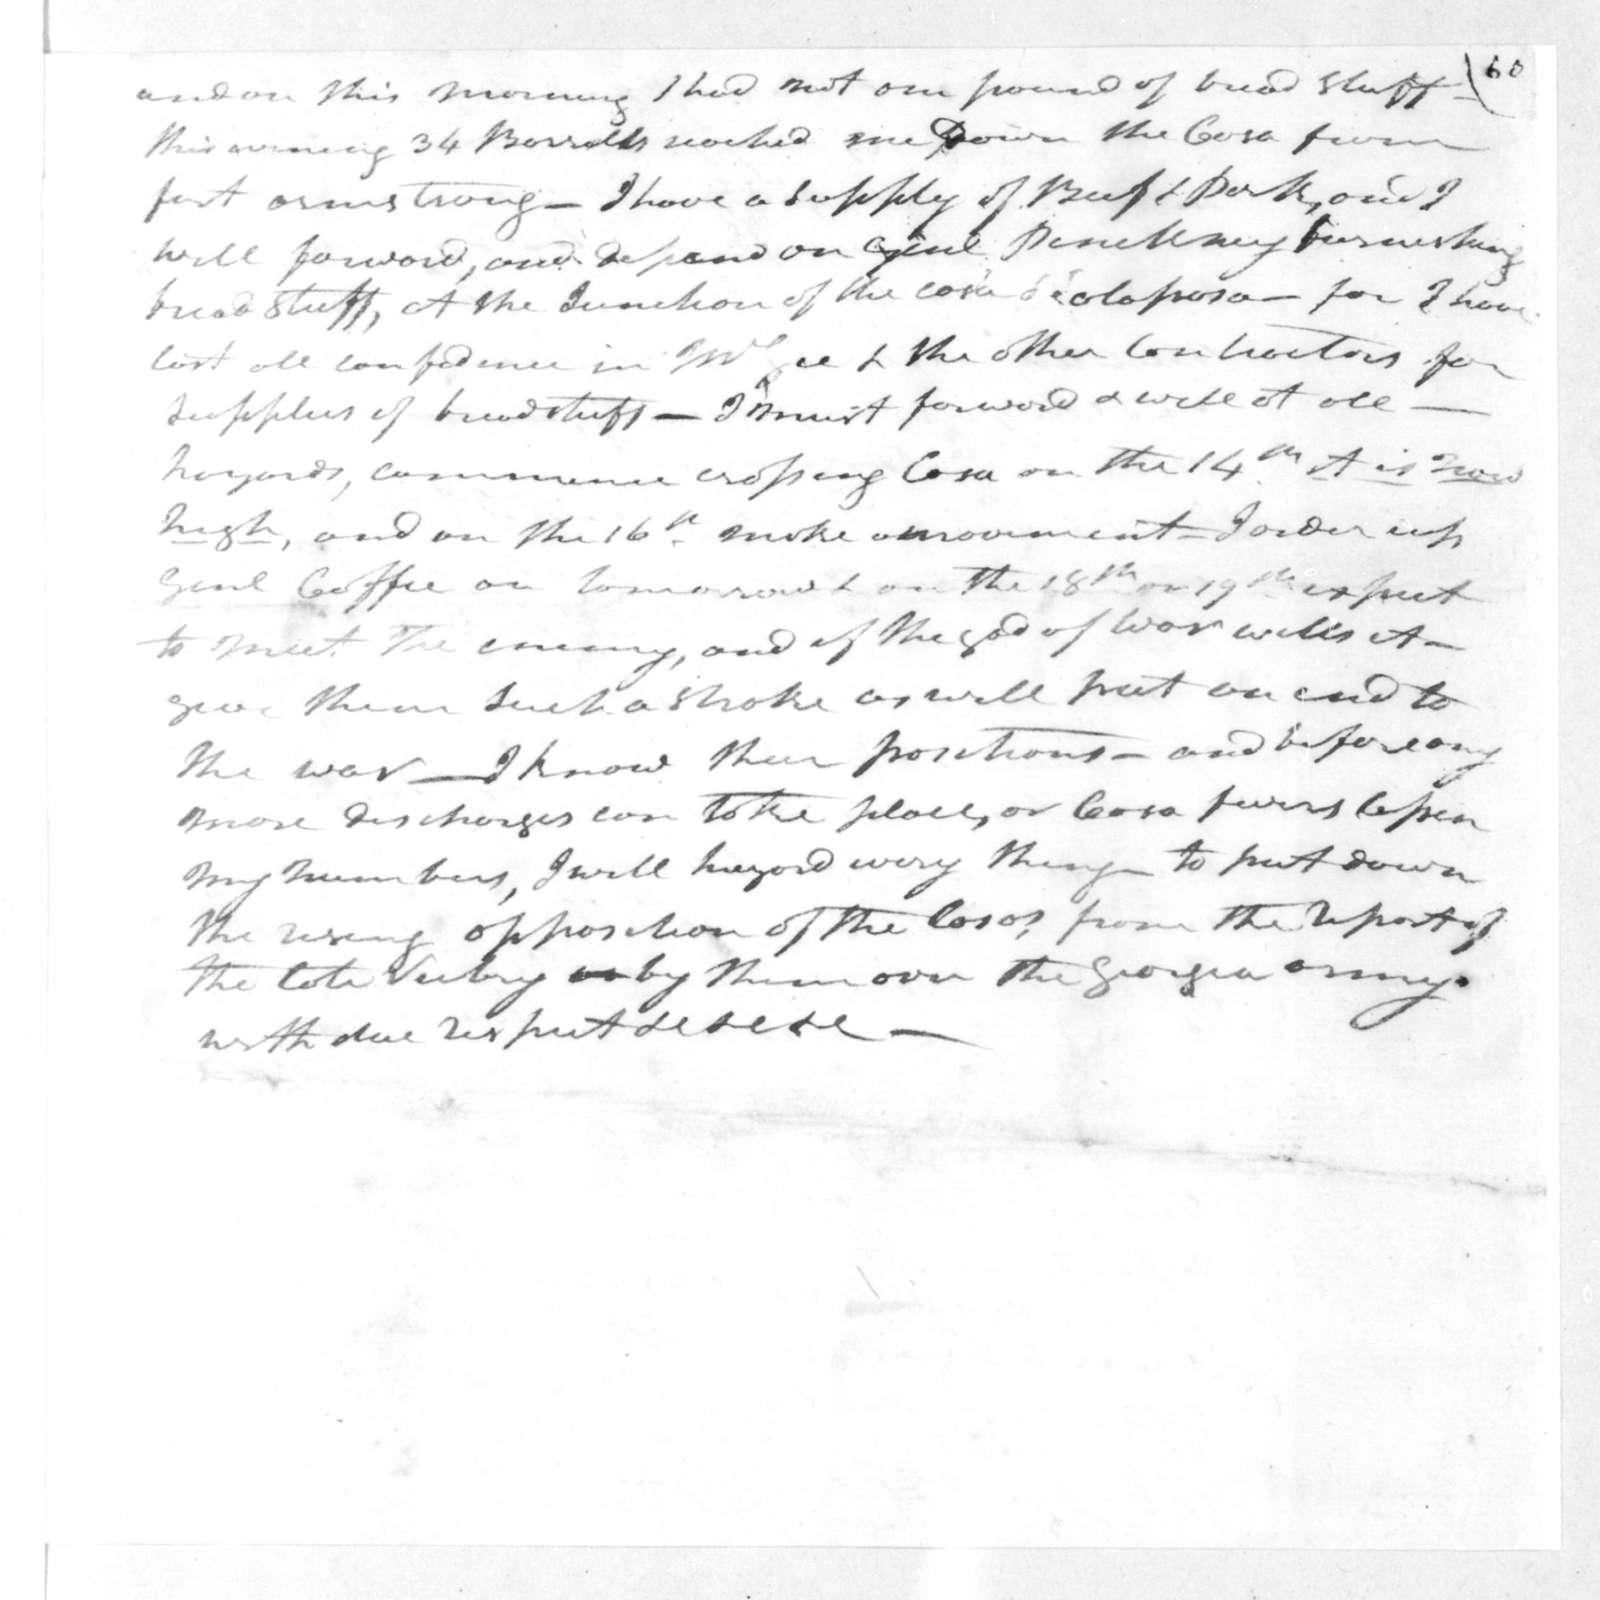 Andrew Jackson to Willie Blount, February 12, 1813